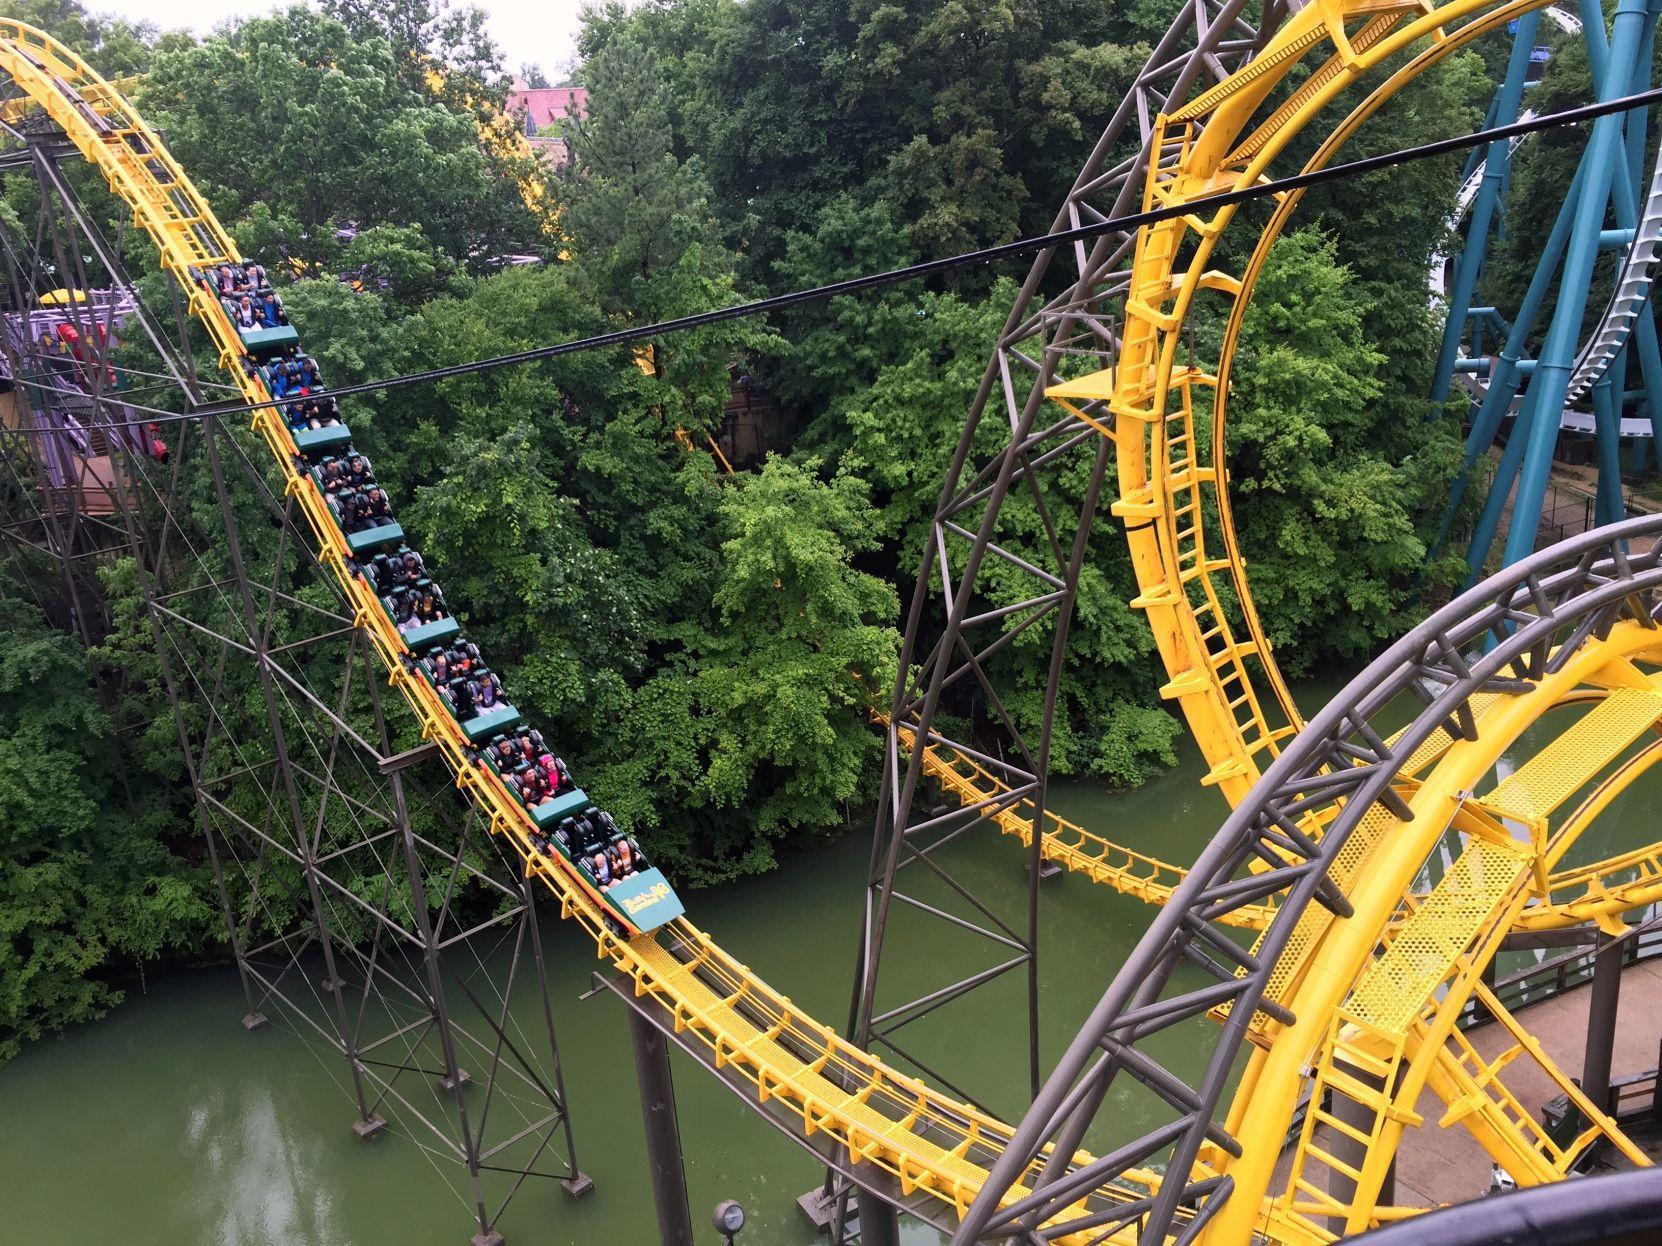 The Loch Ness Monster Roller Coaster Busch Gardens Williamsburg.